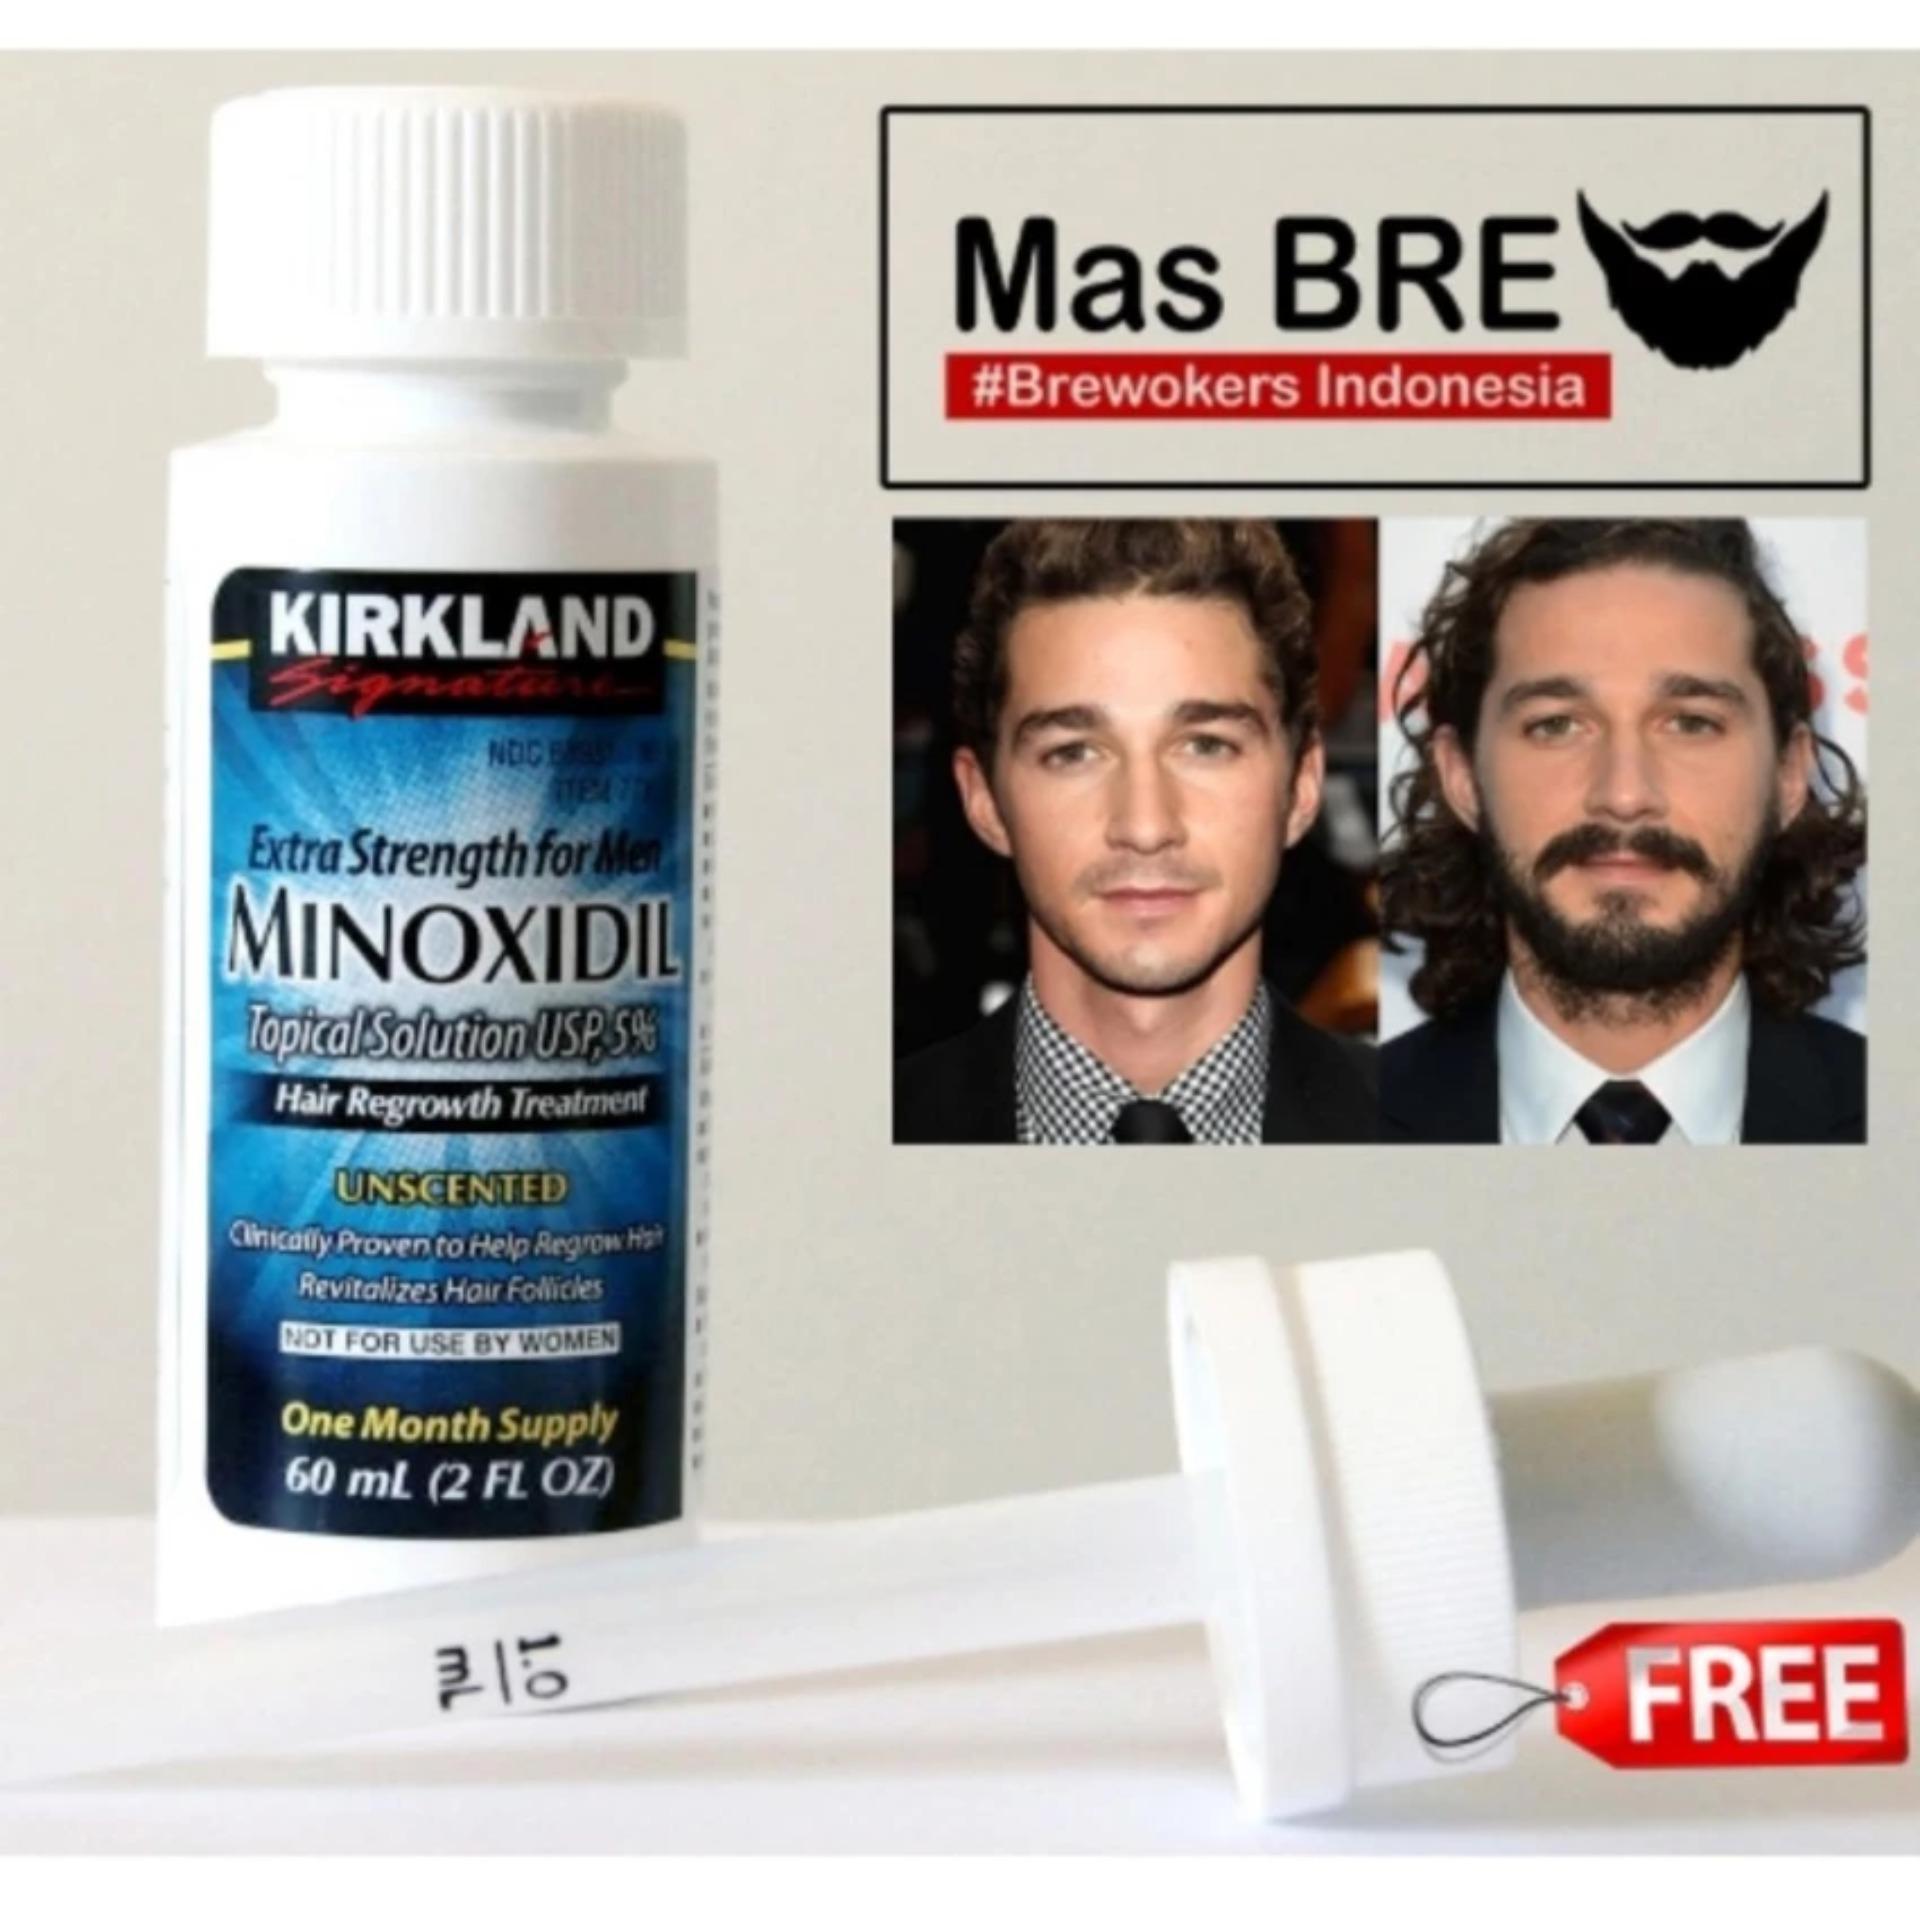 Online Murah Kirkland Minoxidil 5 Original Usa Obat Penumbuh Krim Jambang Wak Doyok 100 Kumis Bulu Halus Rambut Dll